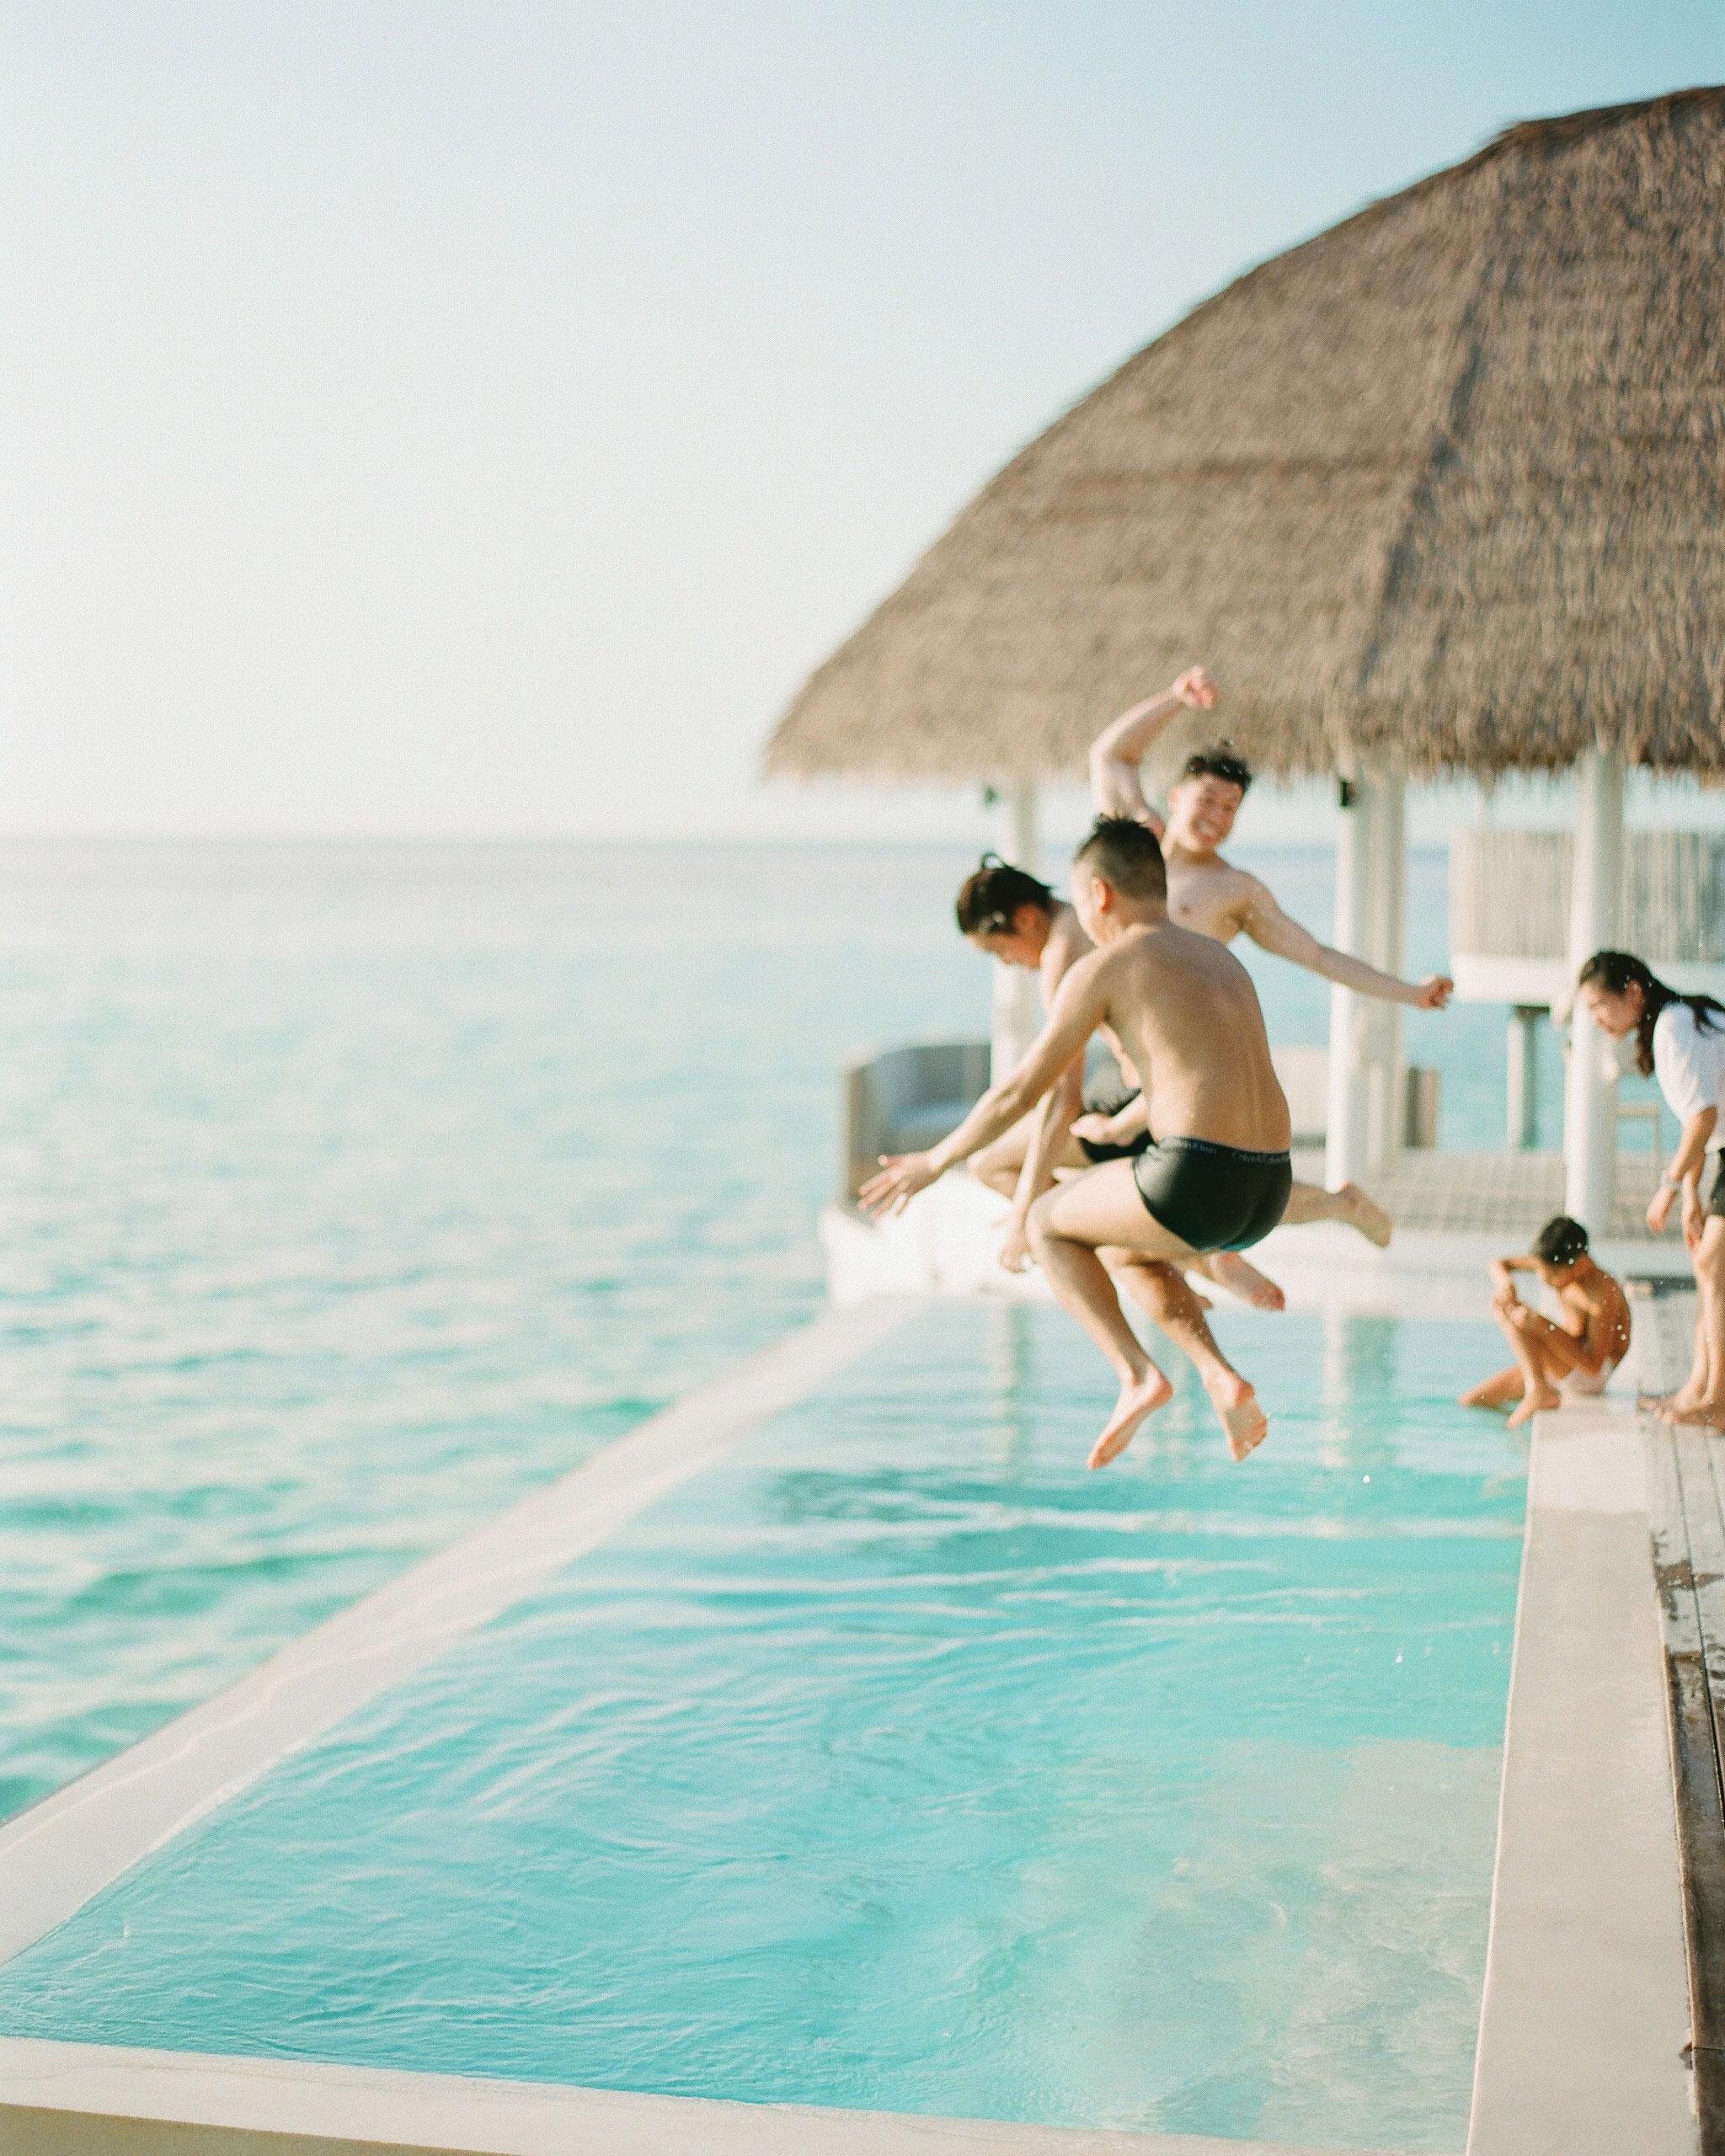 peony-richard-wedding-maldives-jumping-in-pool-0467-s112383.jpg